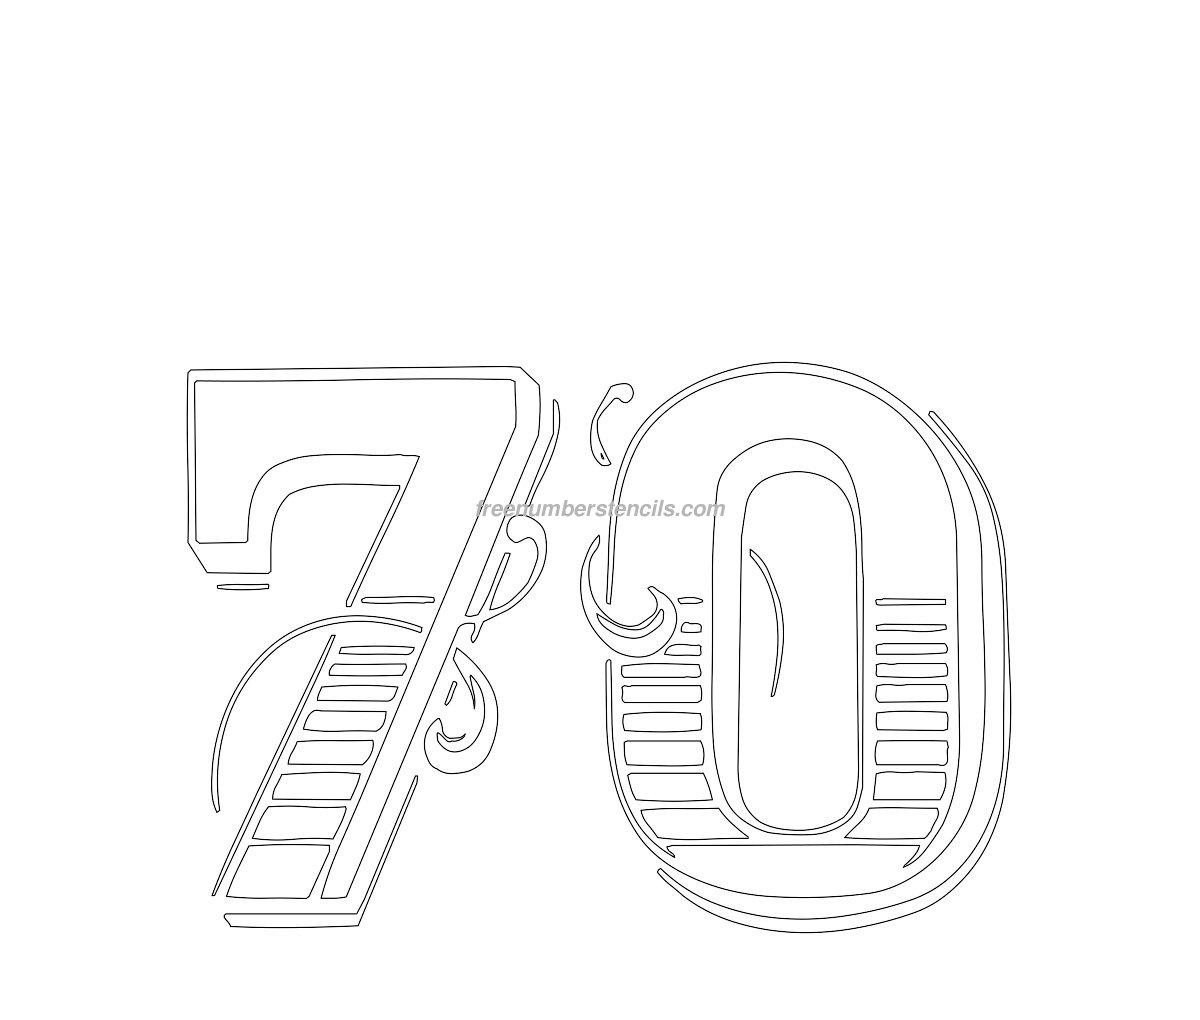 free decorative 70 number stencil